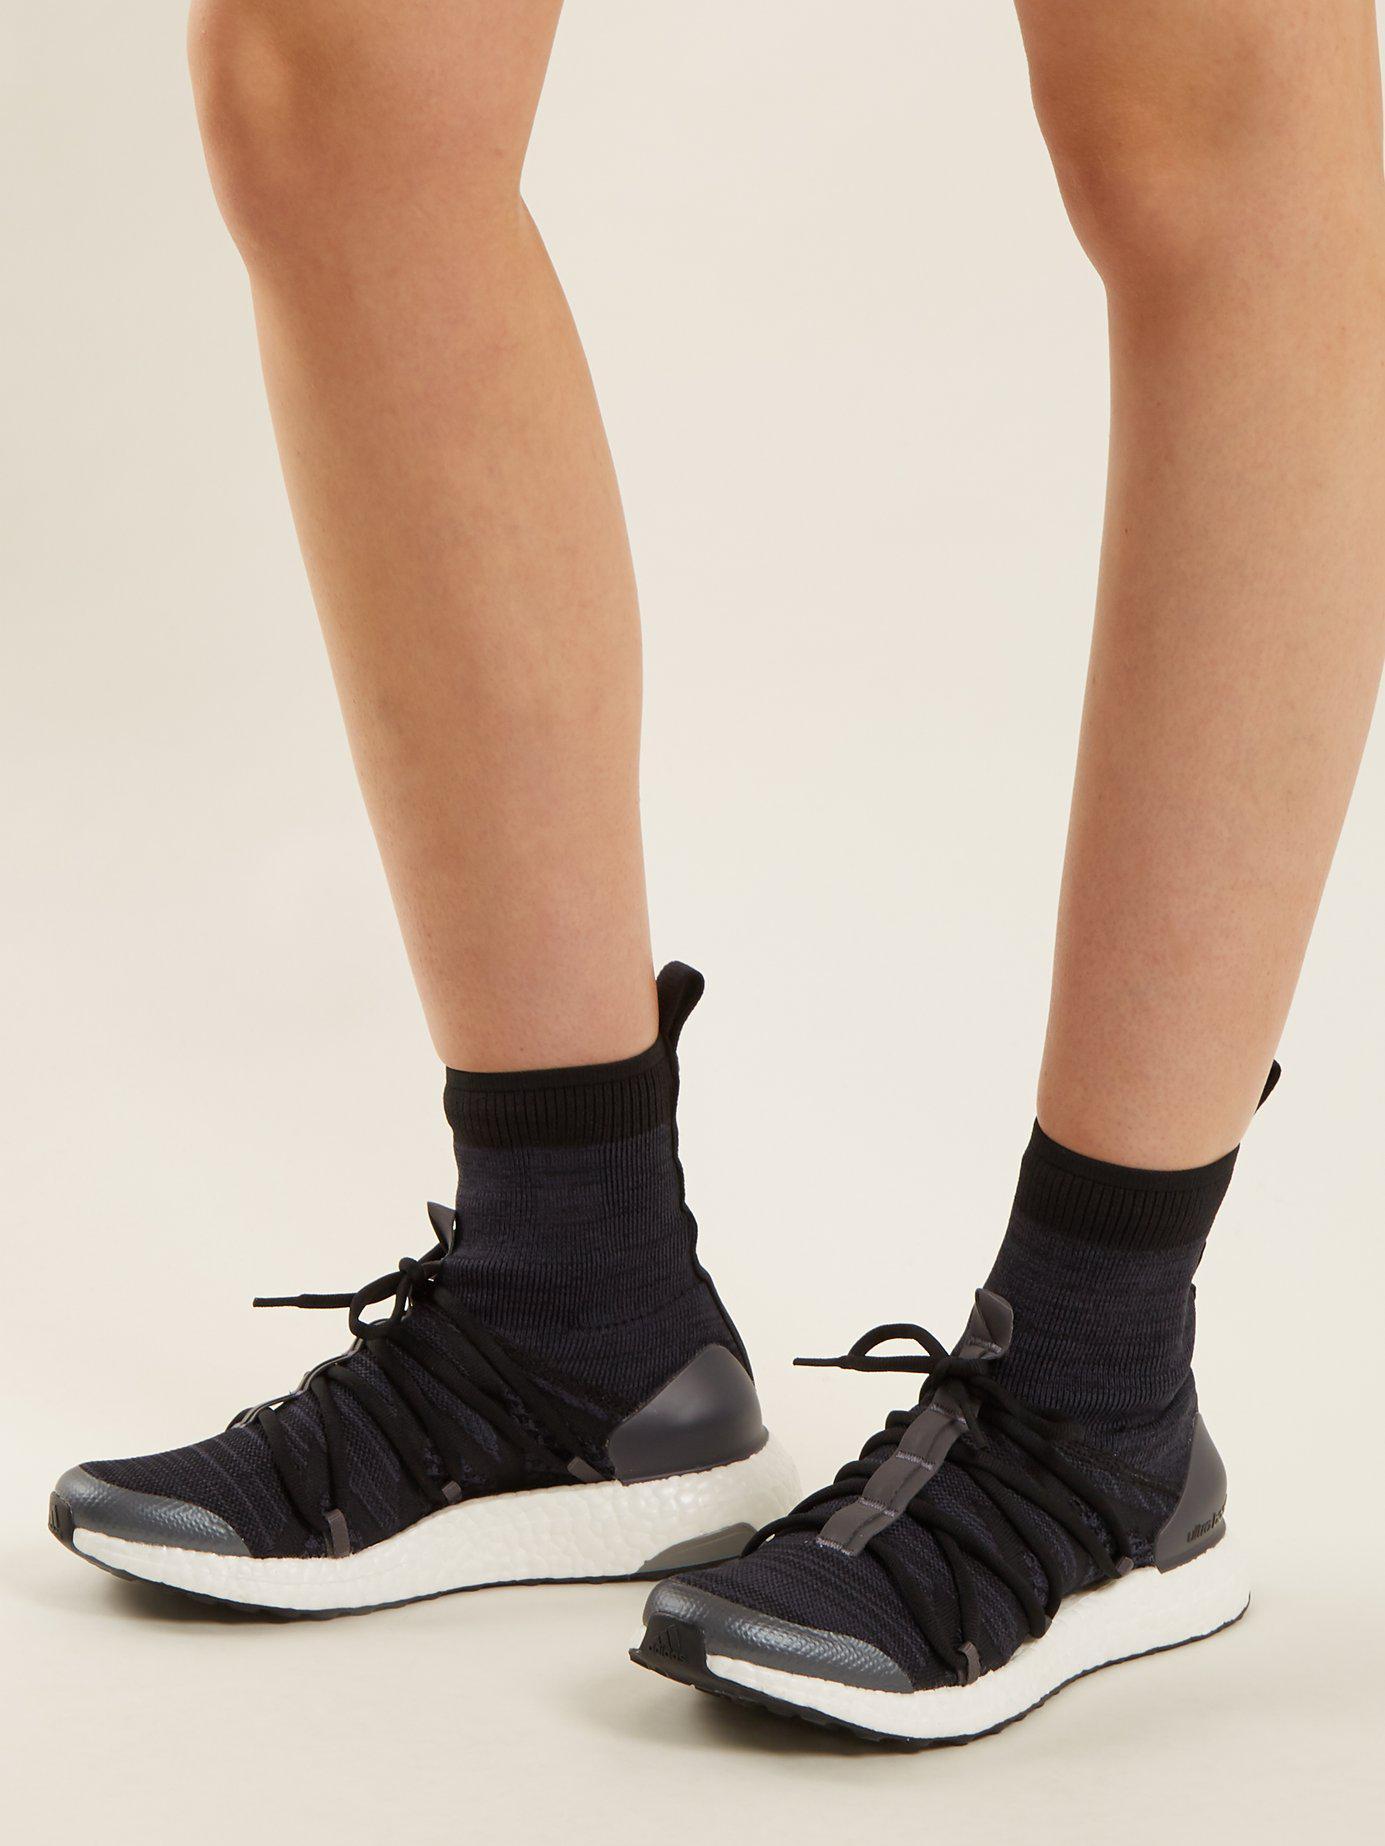 best website d28cc 2e87c adidas By Stella McCartney Ultra Boost X High-top Sock Trainers in ...